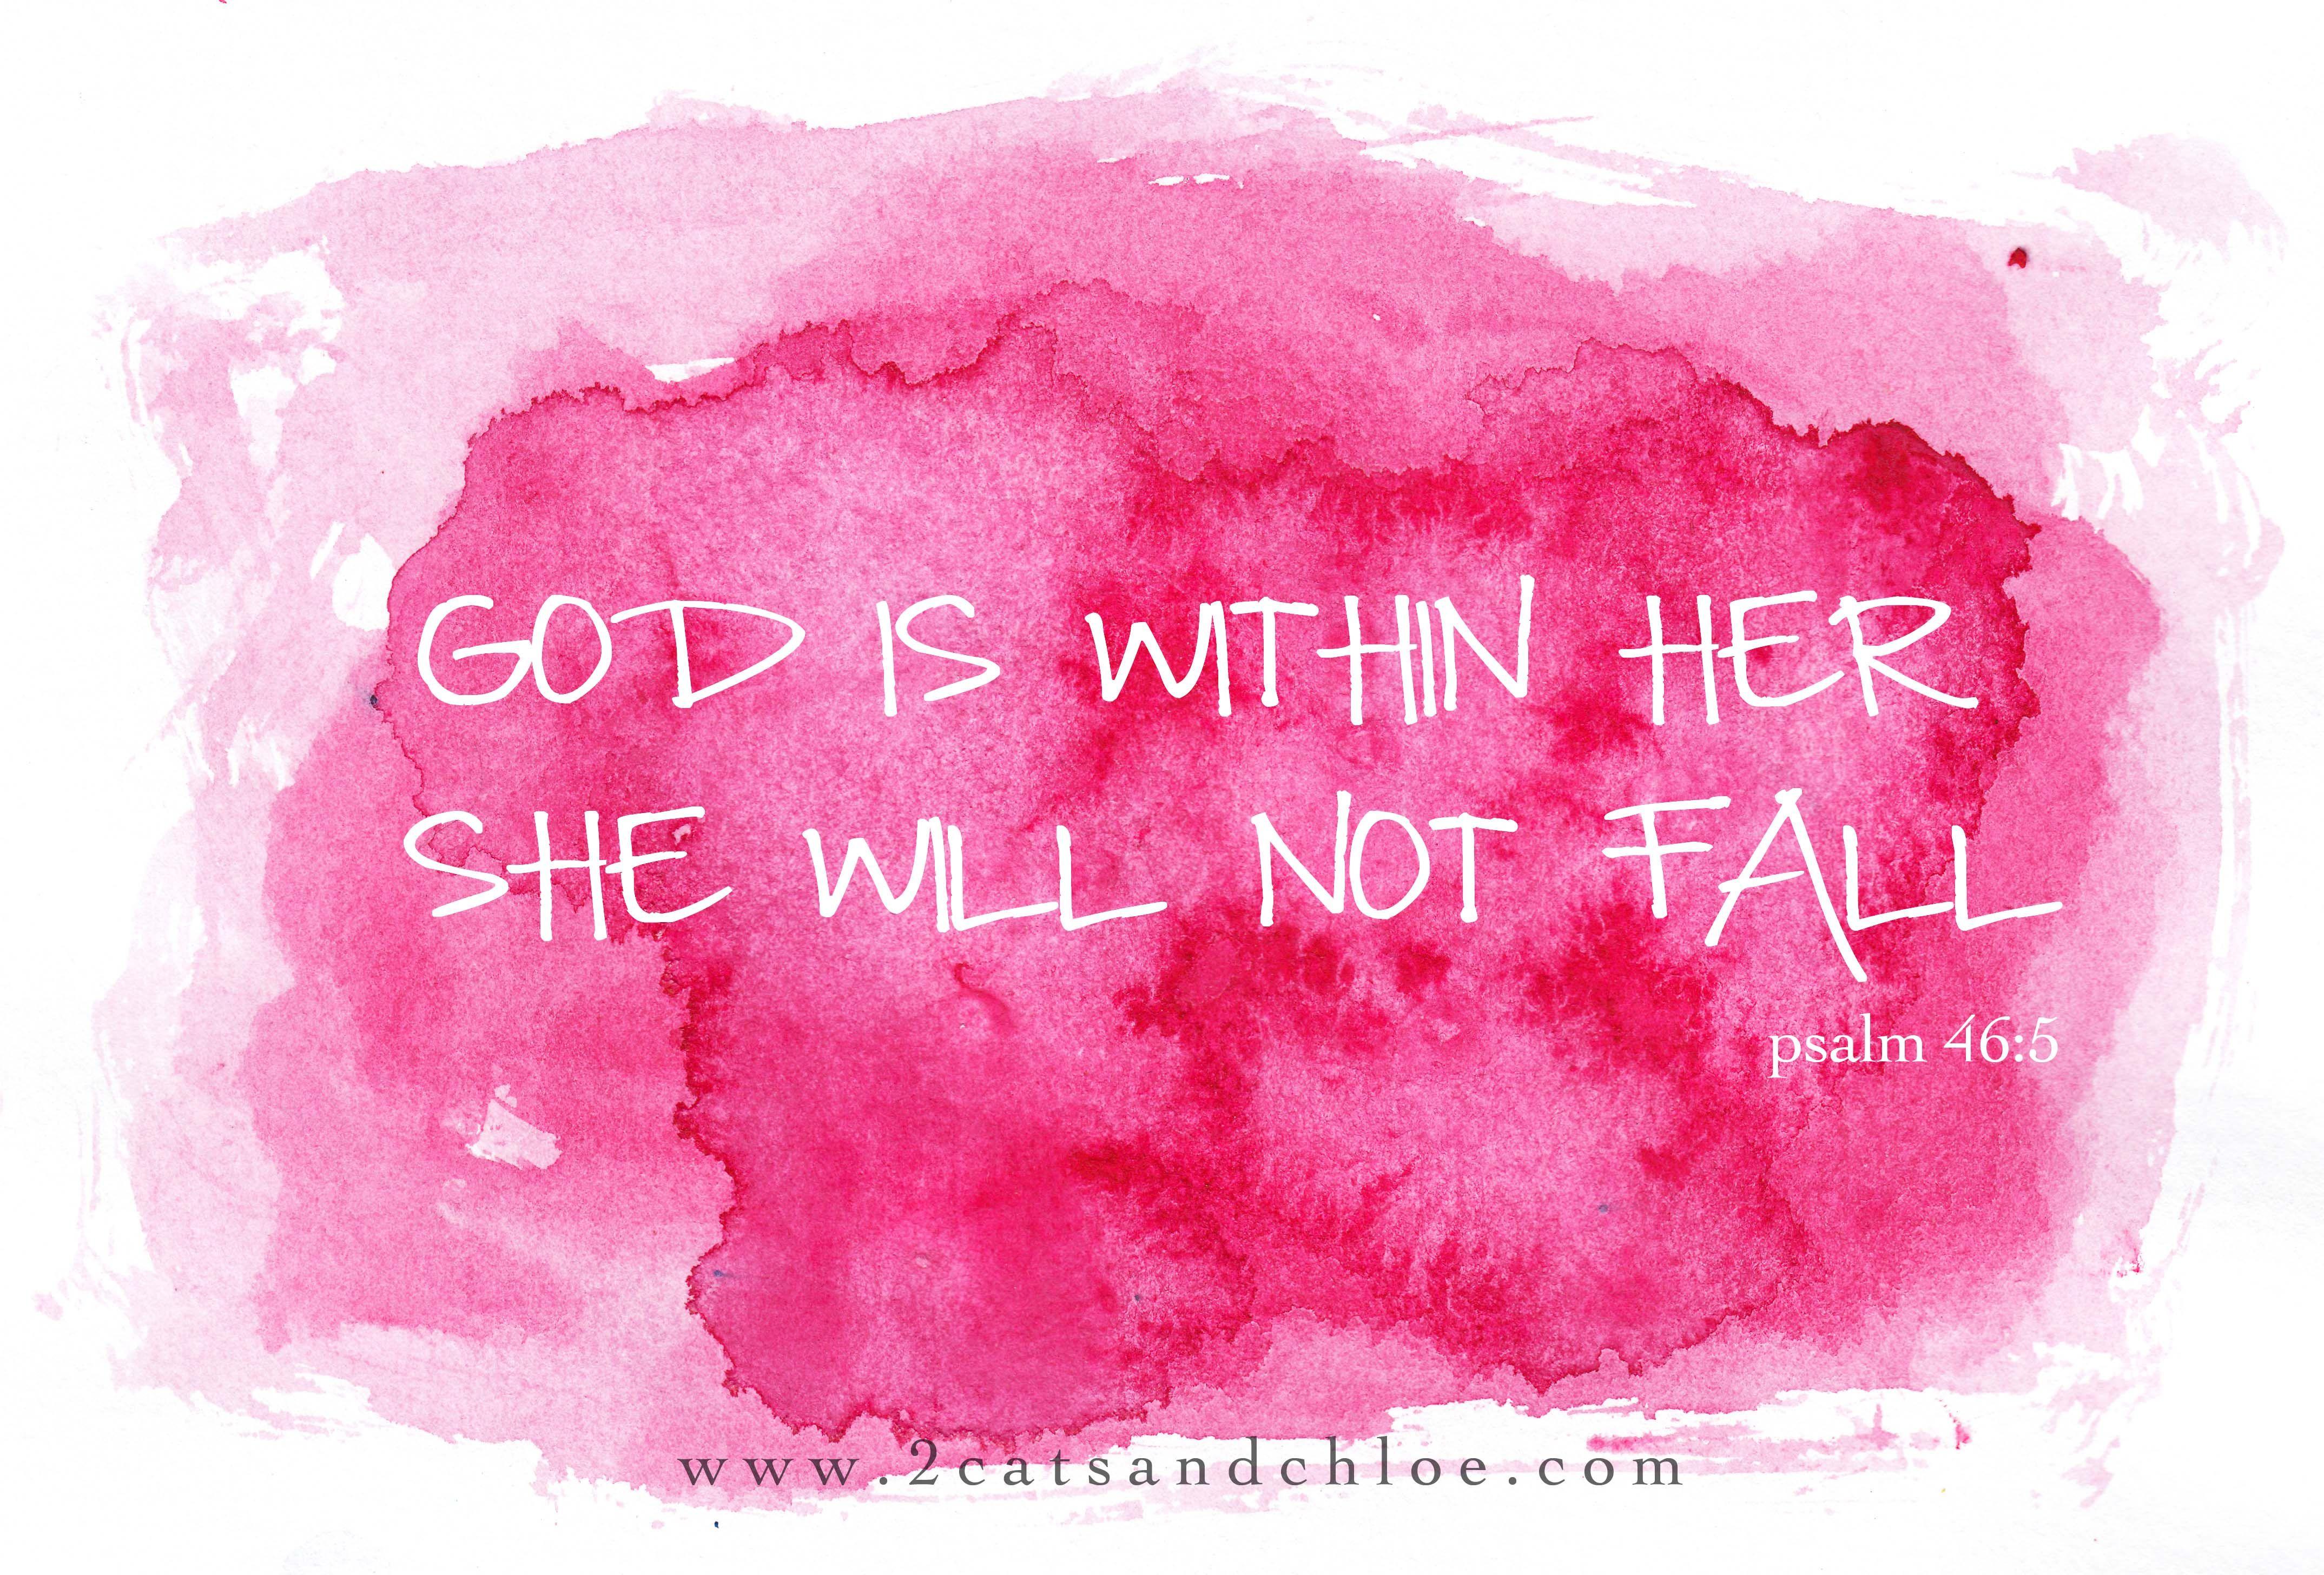 Beautiful Wallpaper Mac Bible Verse - 5f62c23d7624686aca8805c56256f513  Collection_244862.jpg